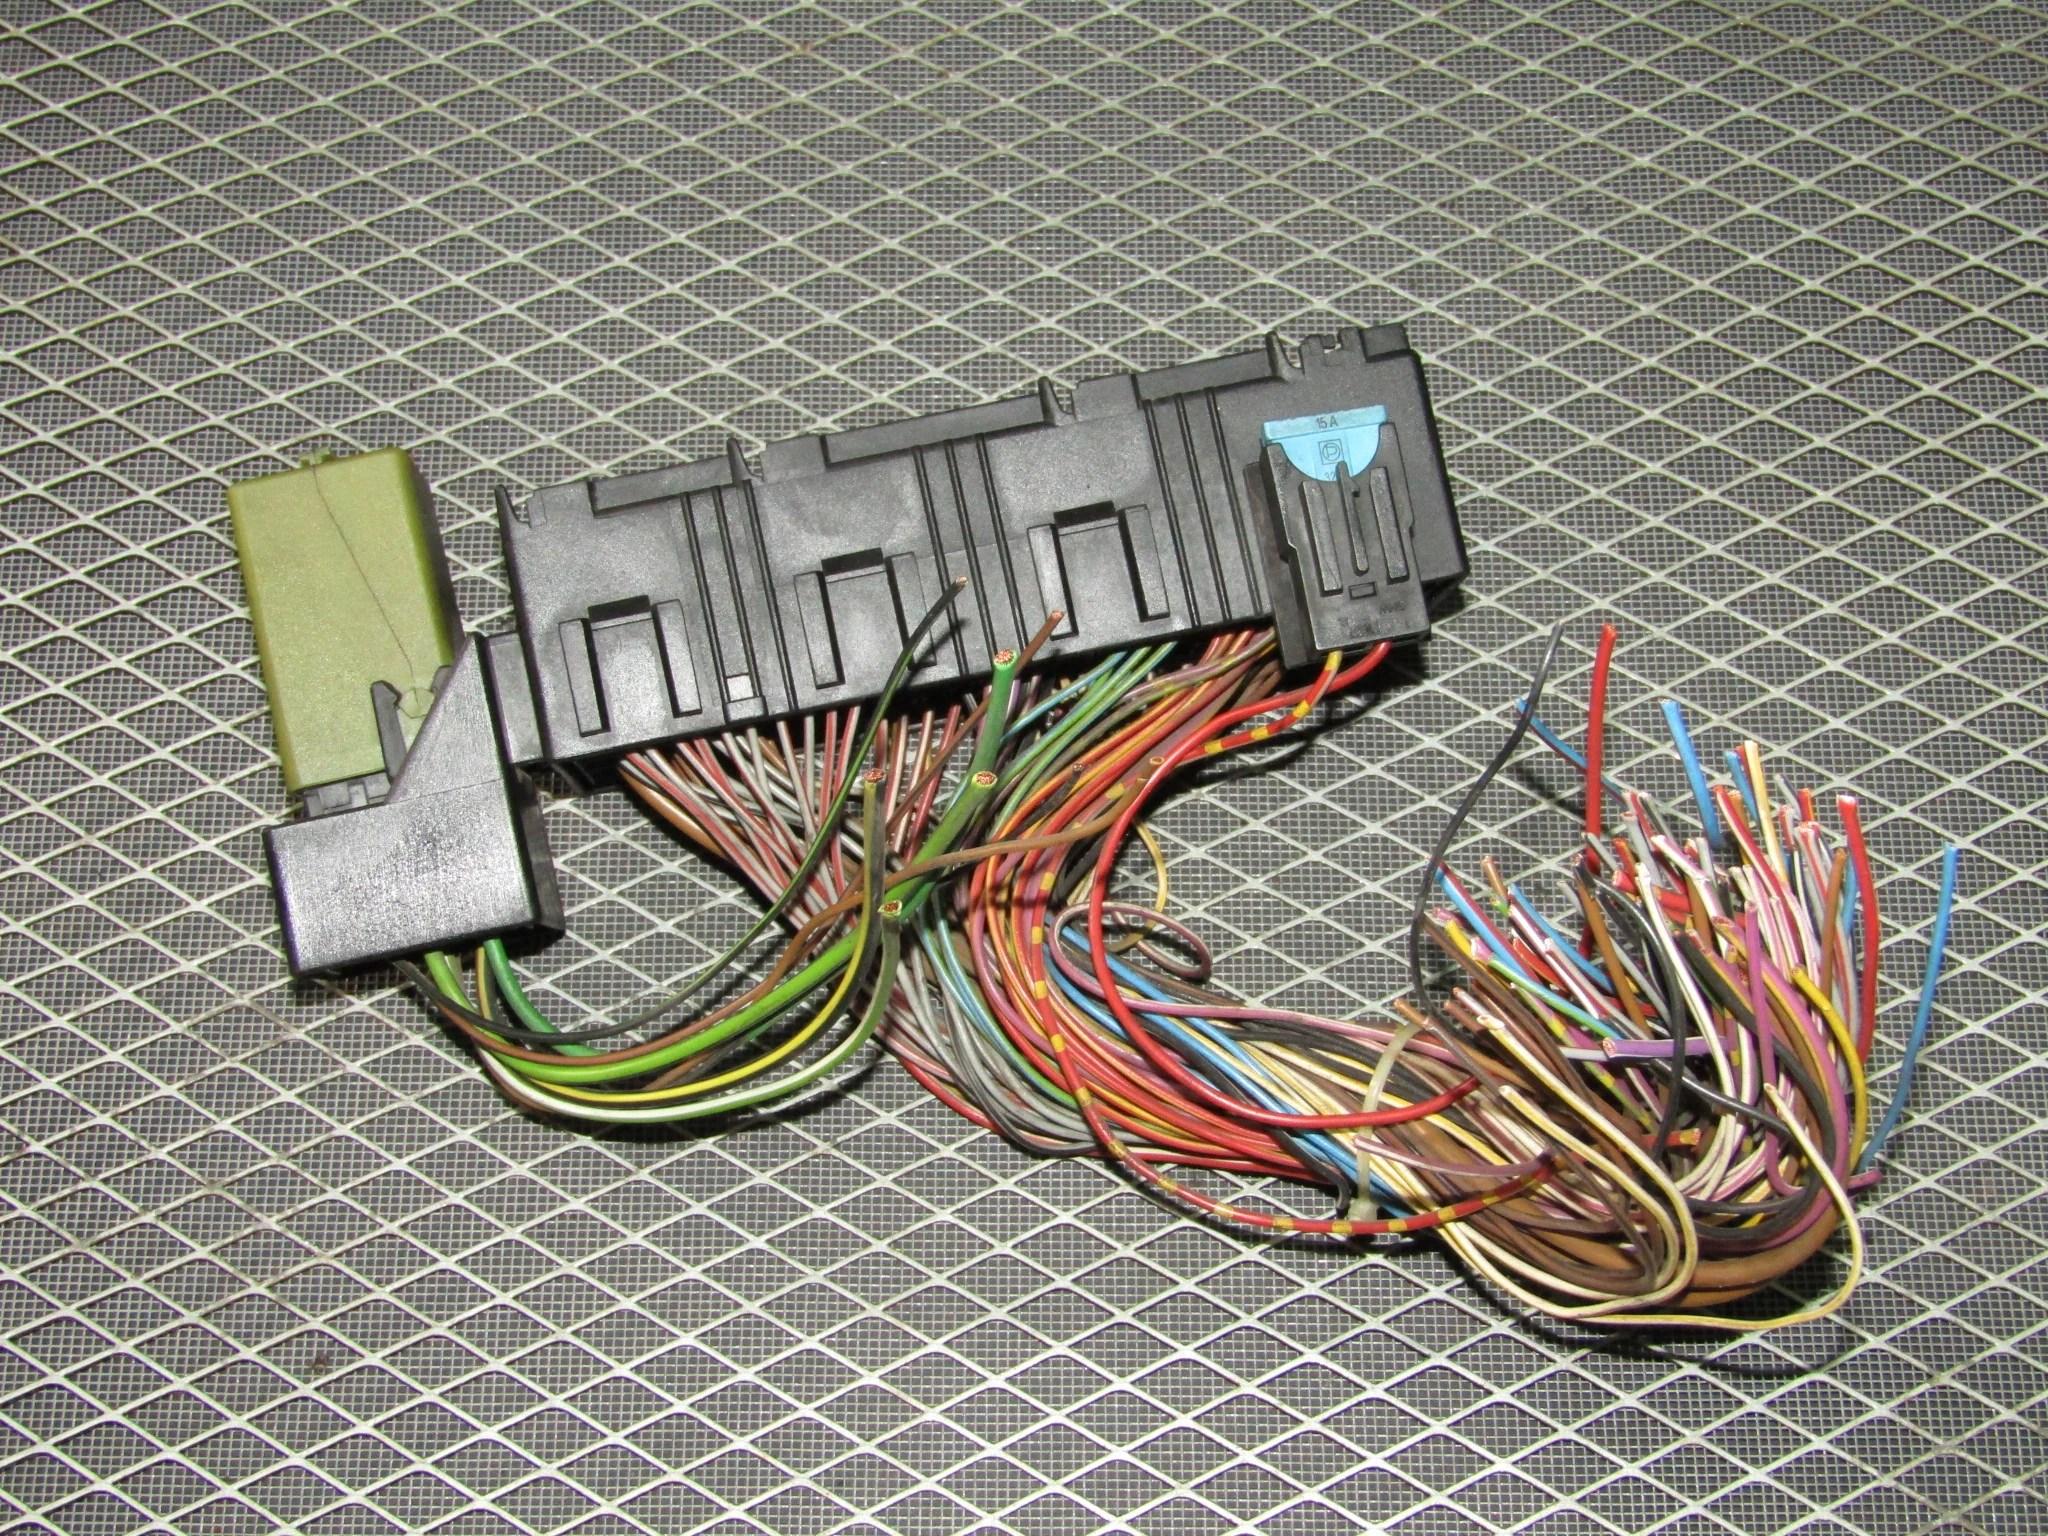 92 93 94 95 bmw 325 oem interior fuse box  [ 2048 x 1536 Pixel ]